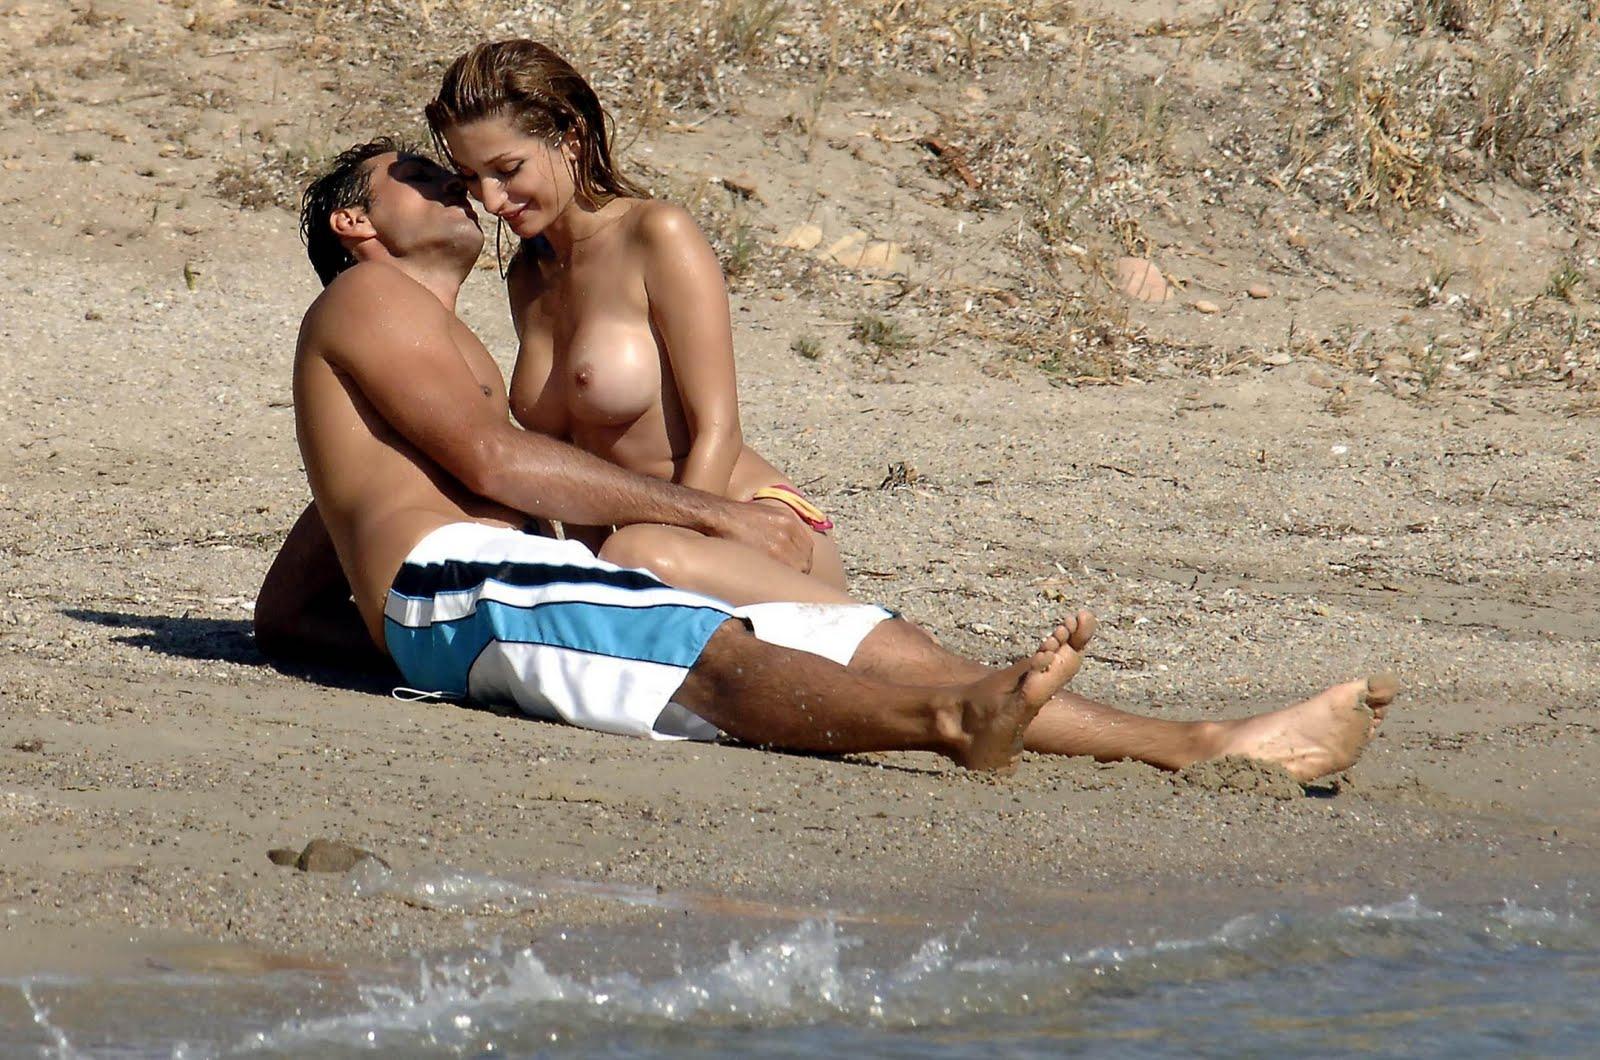 Negar khan nude free porn galery, hot sex pics